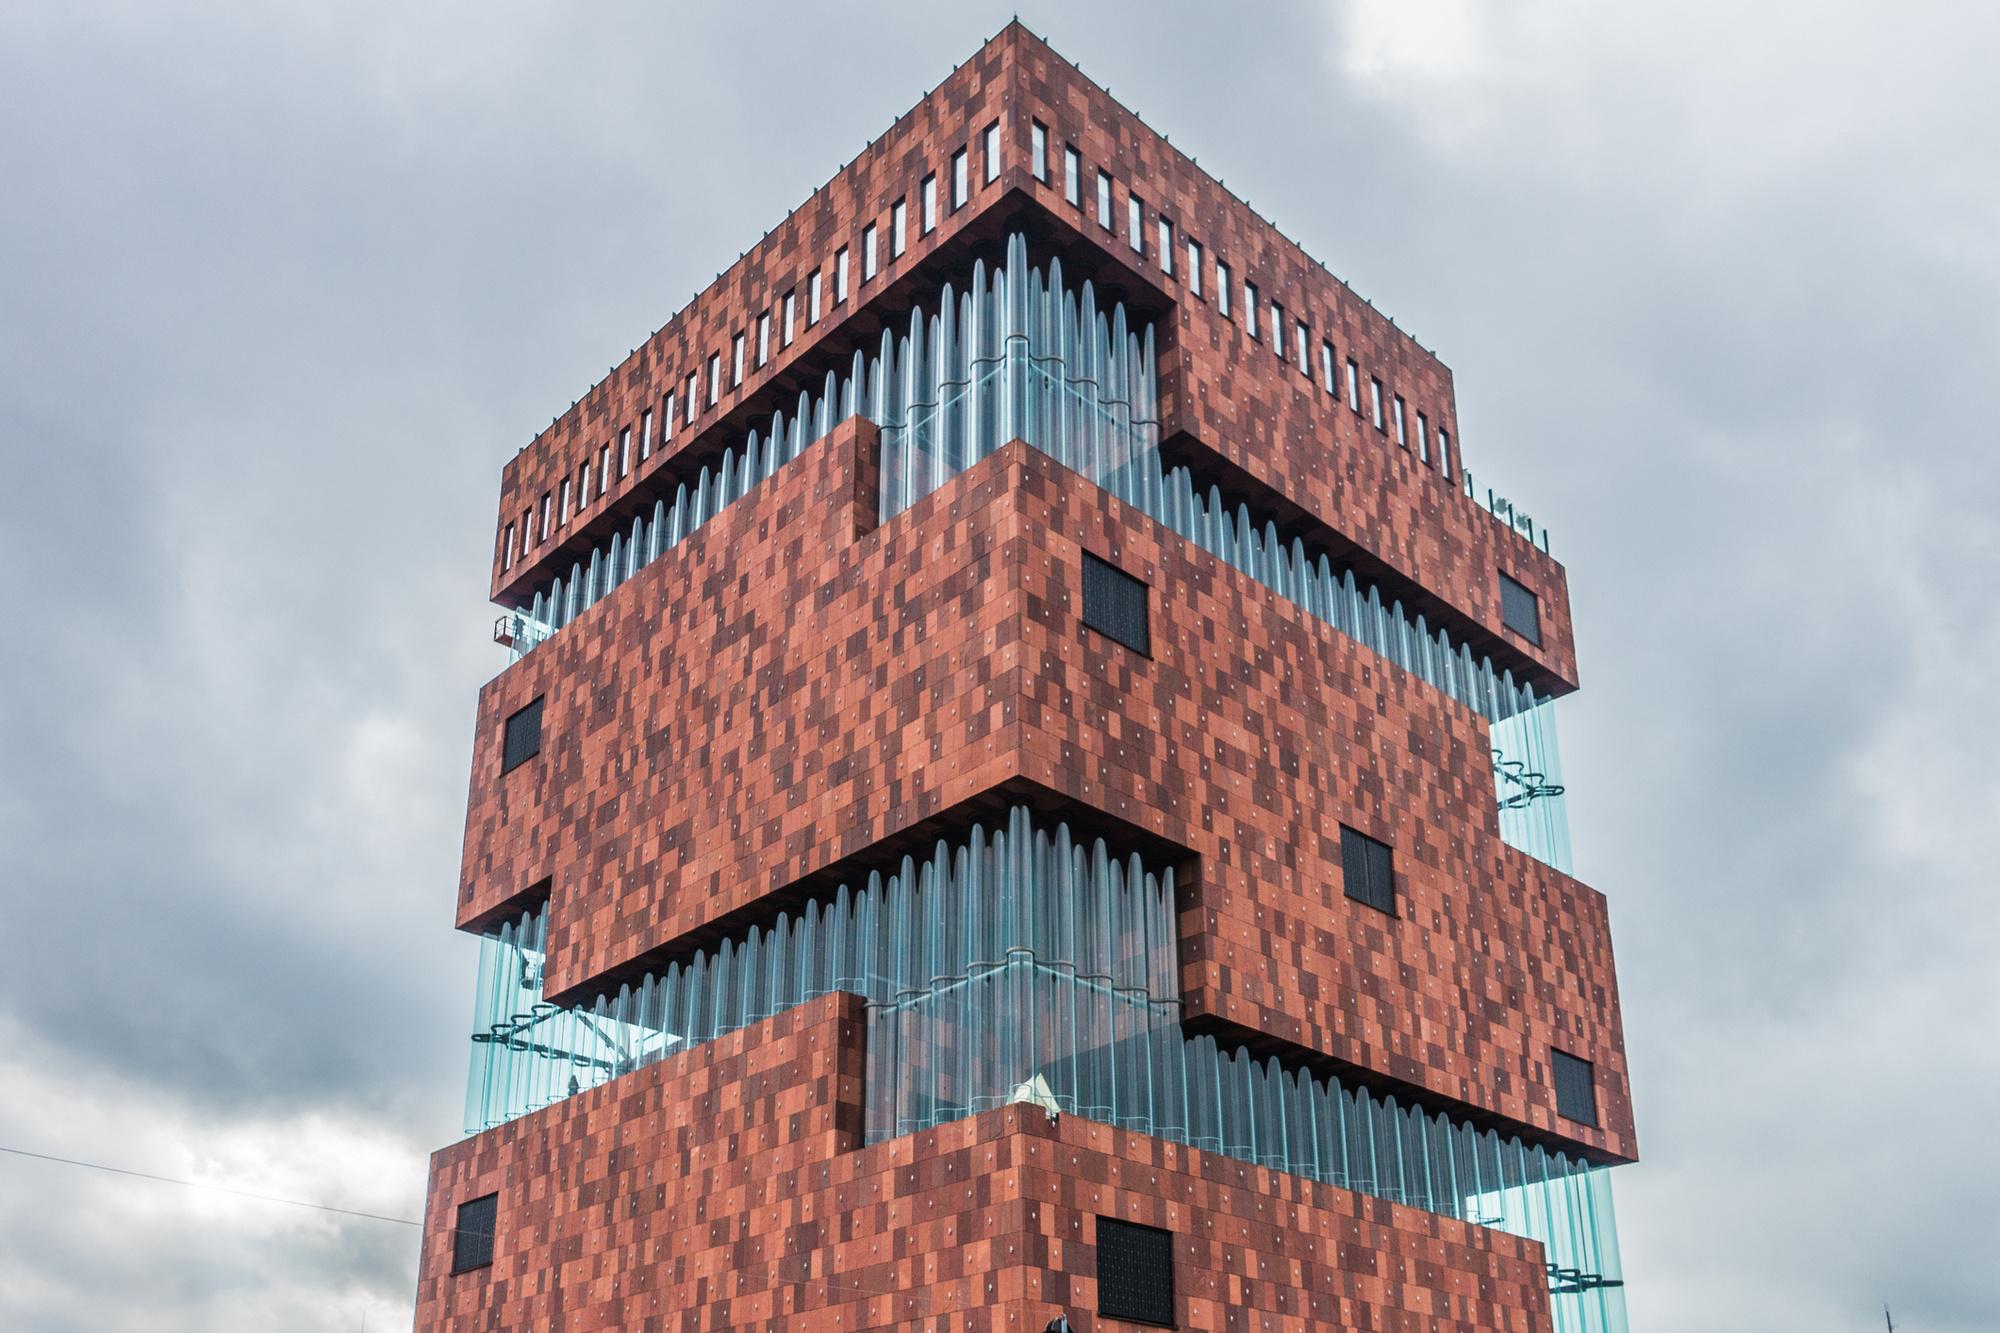 MAS Antwerpen, Neutelings Riedijk Architecten, iStock